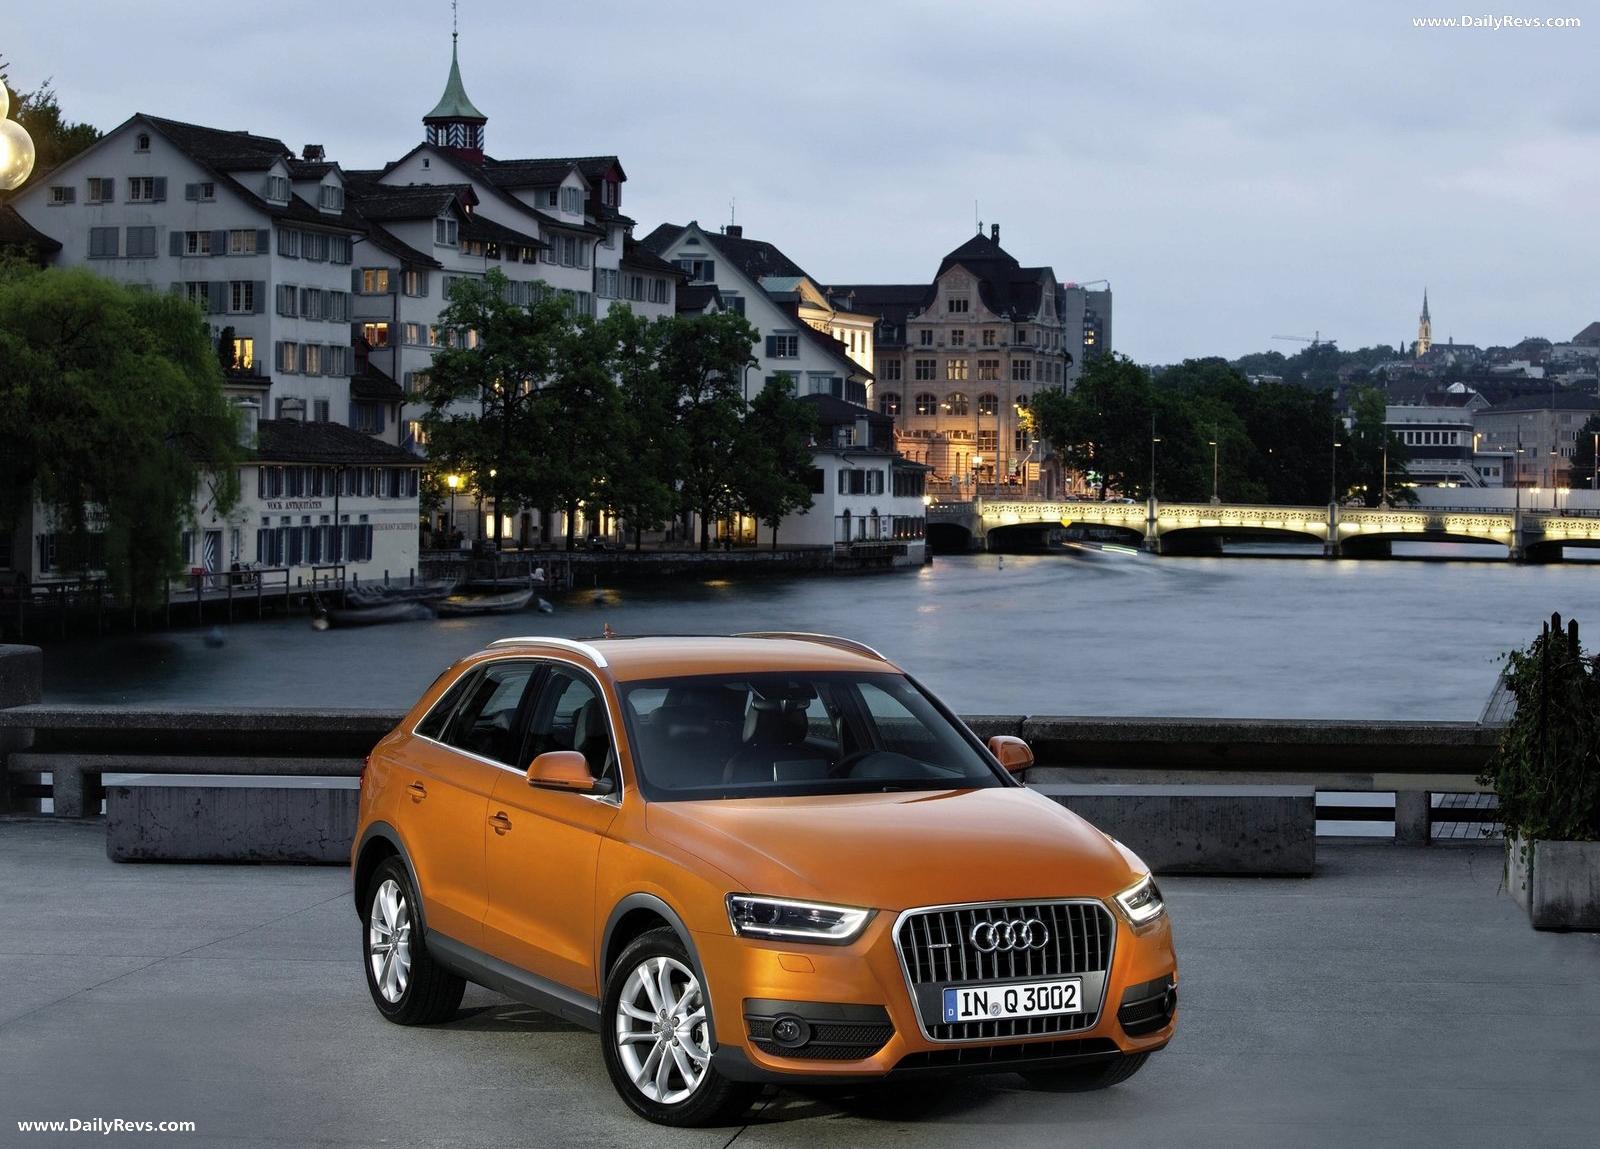 2012 Audi Q3 - HD Pictures, Videos, Specs & Informations ...